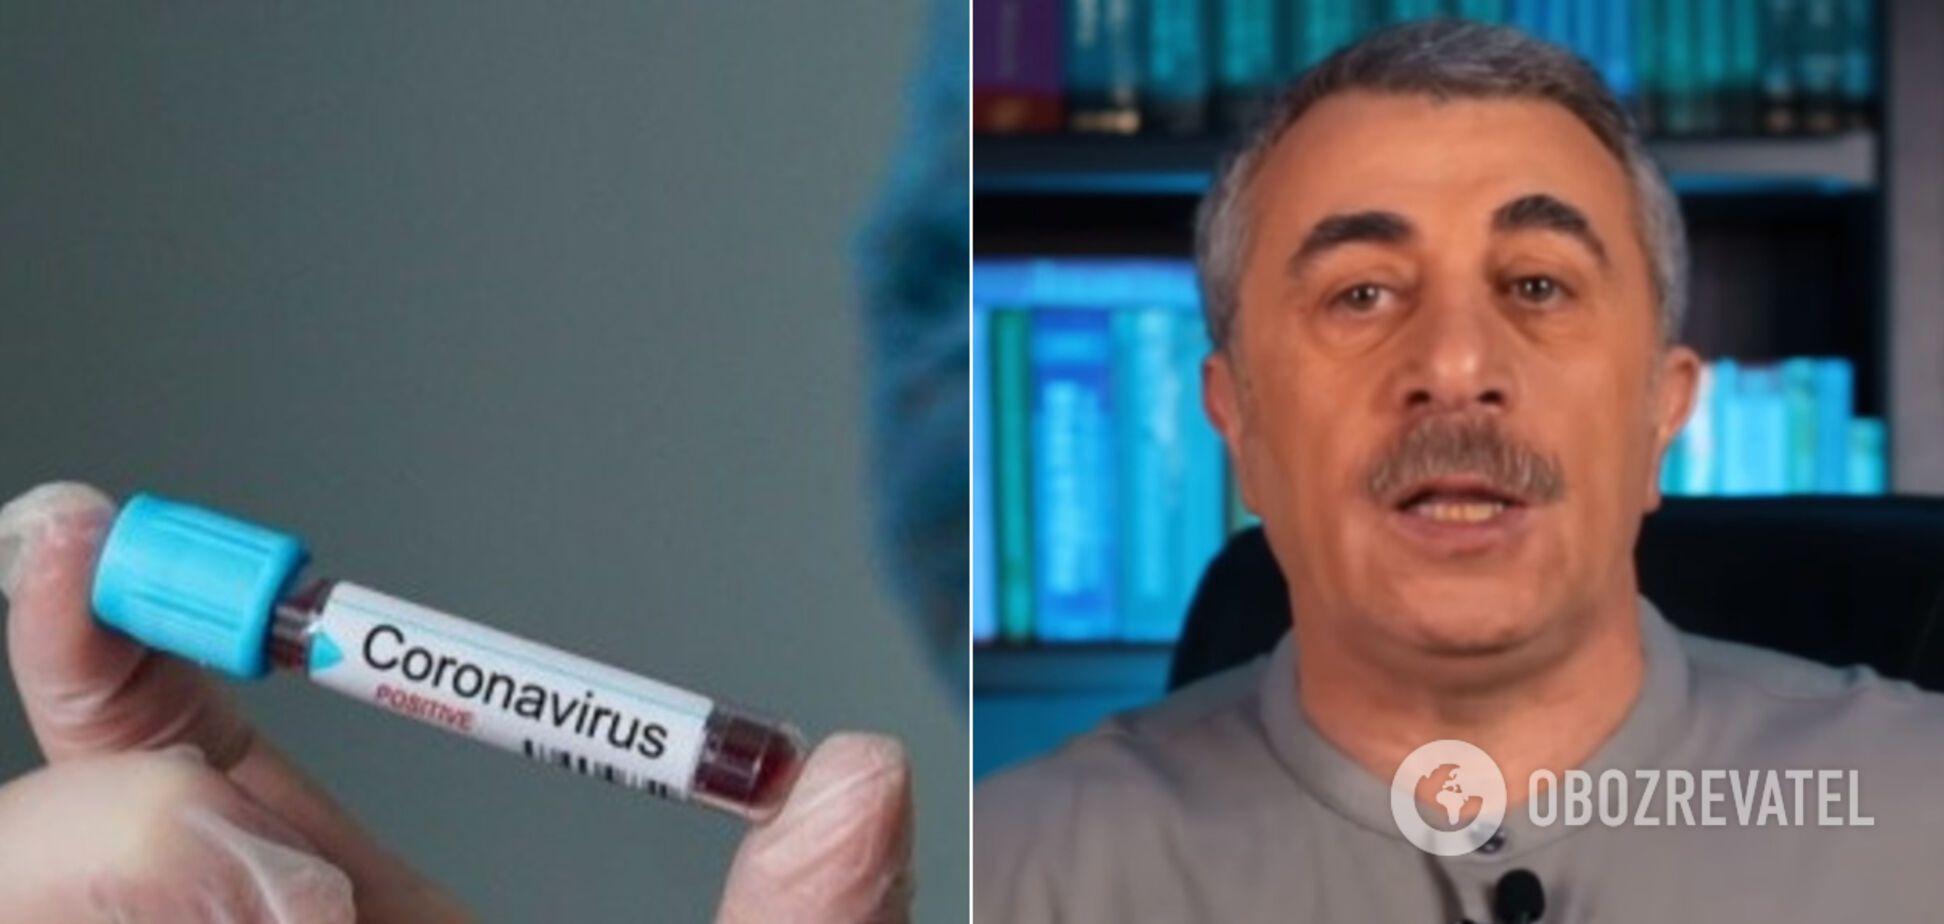 Комаровский развенчал громкий миф о коронавирусе